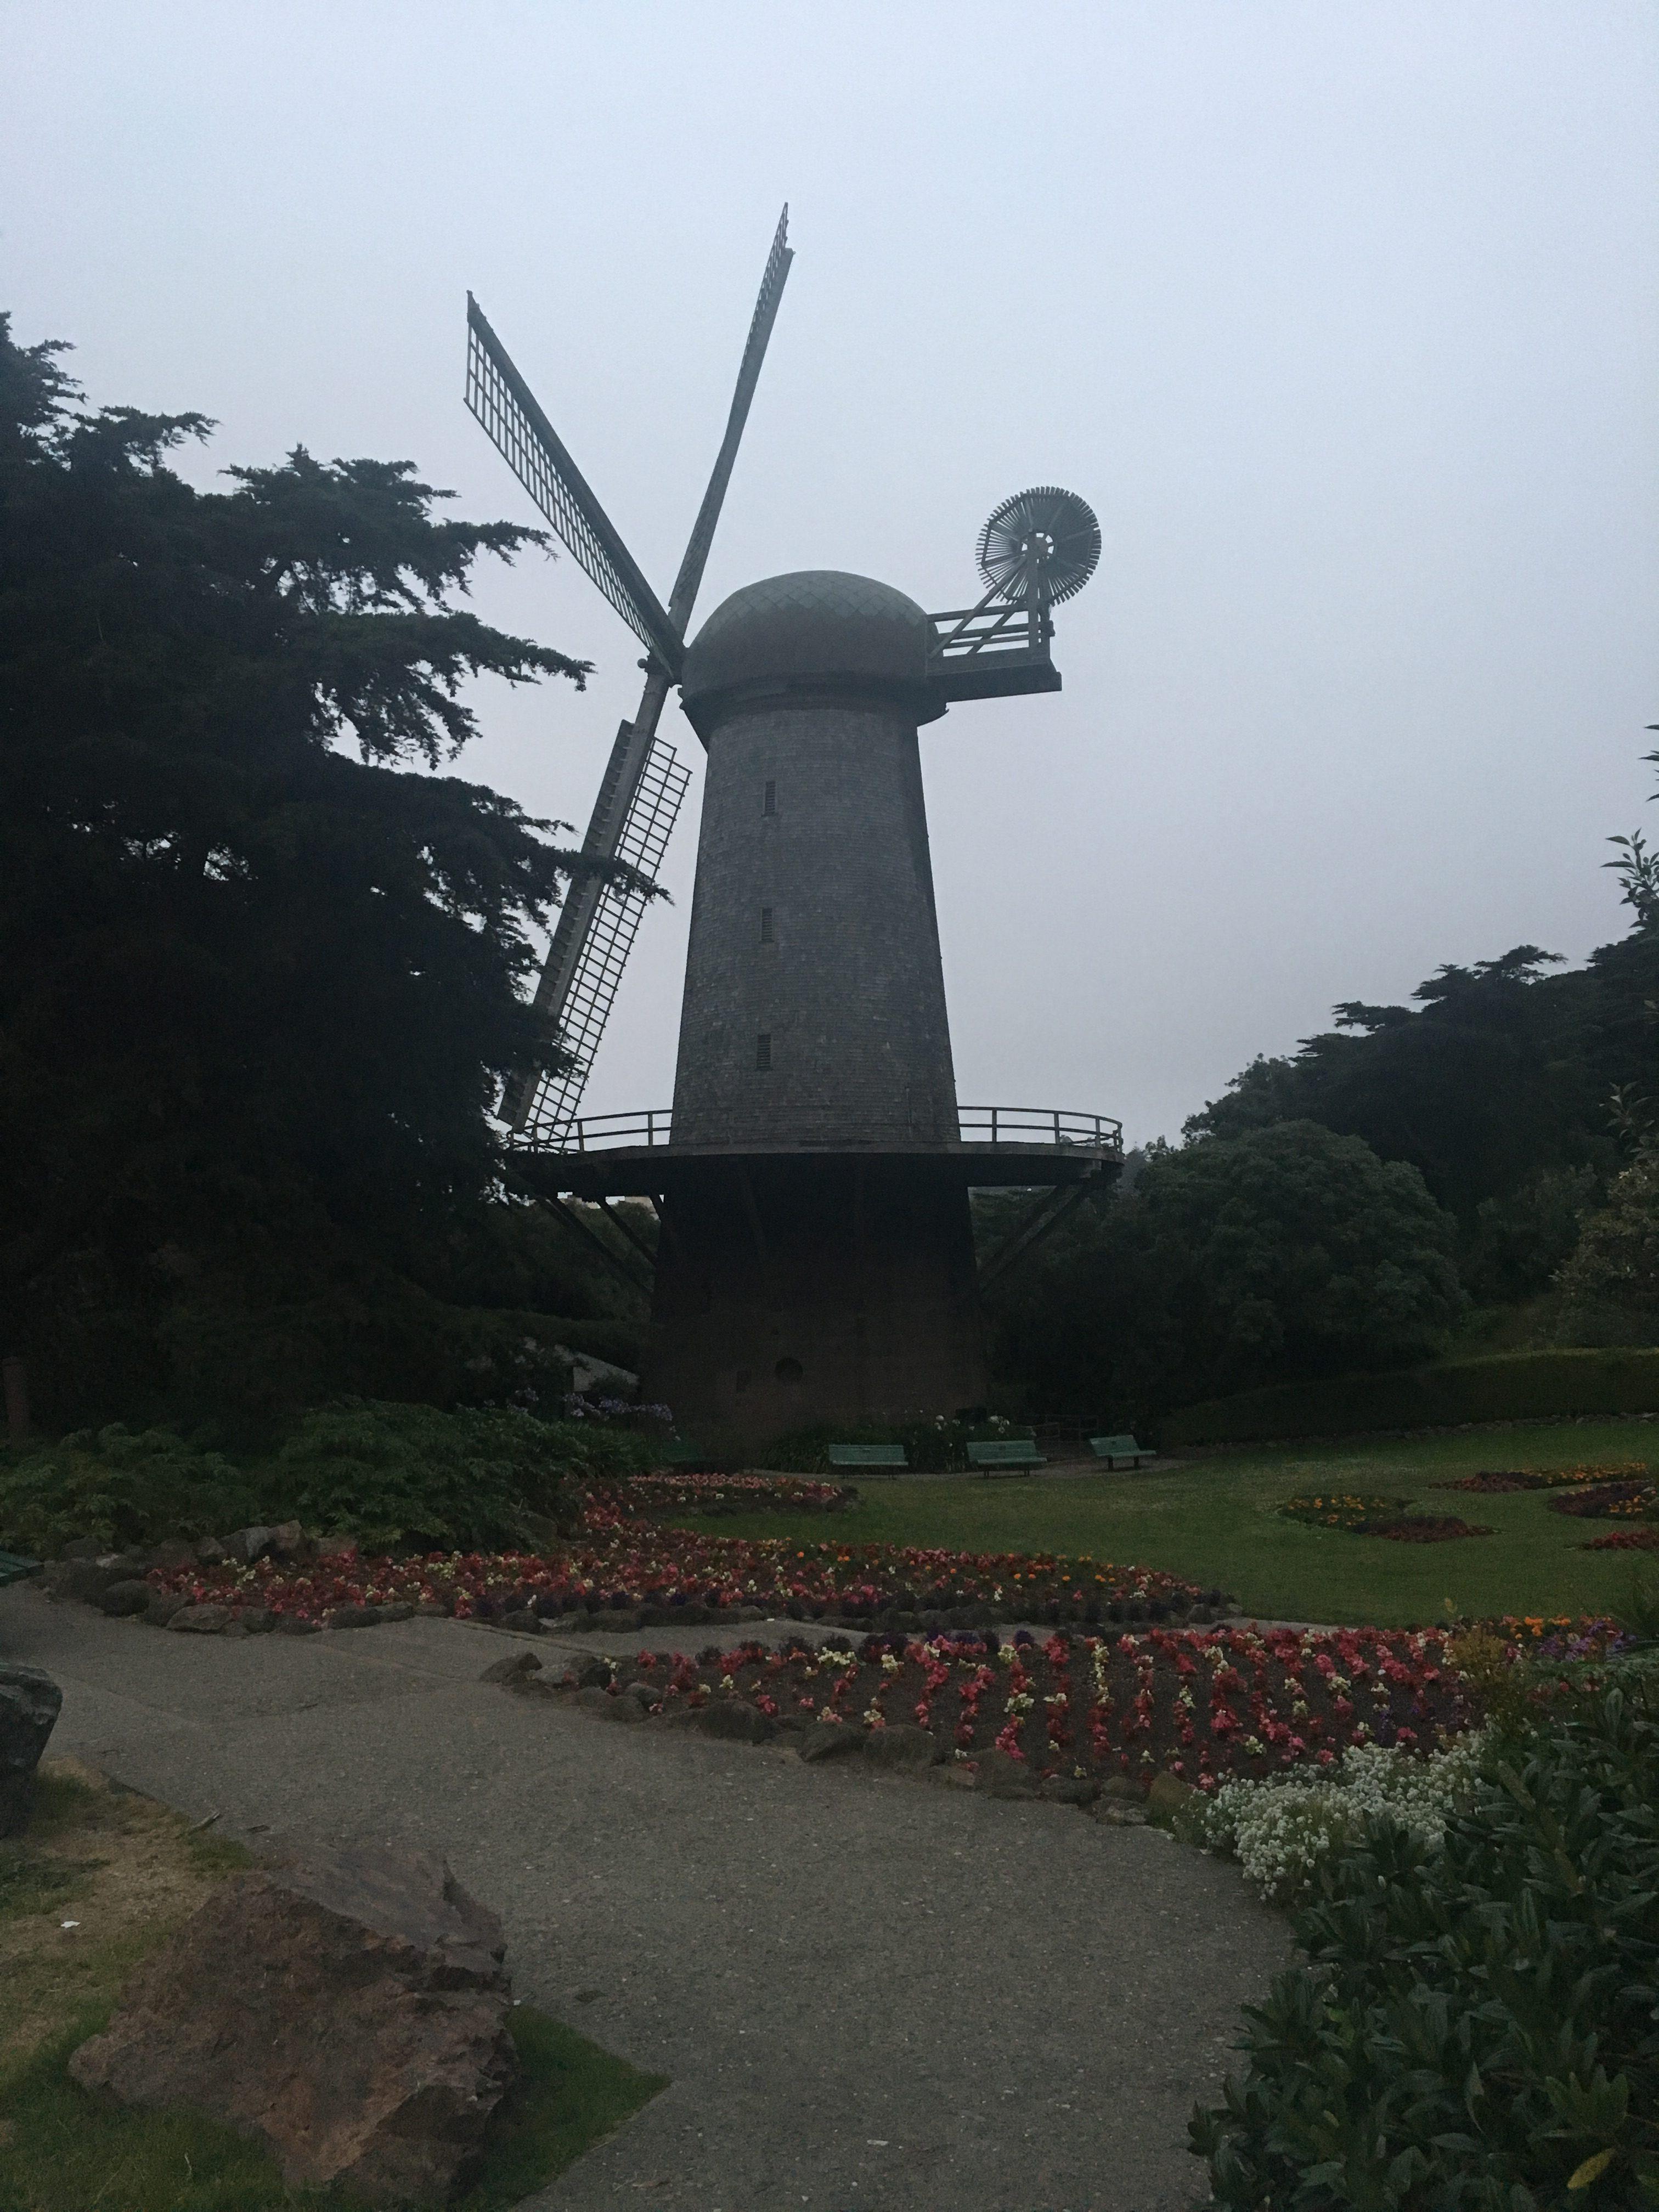 Dutch Windmill (wiatrak holenderski), Golden Gate Park